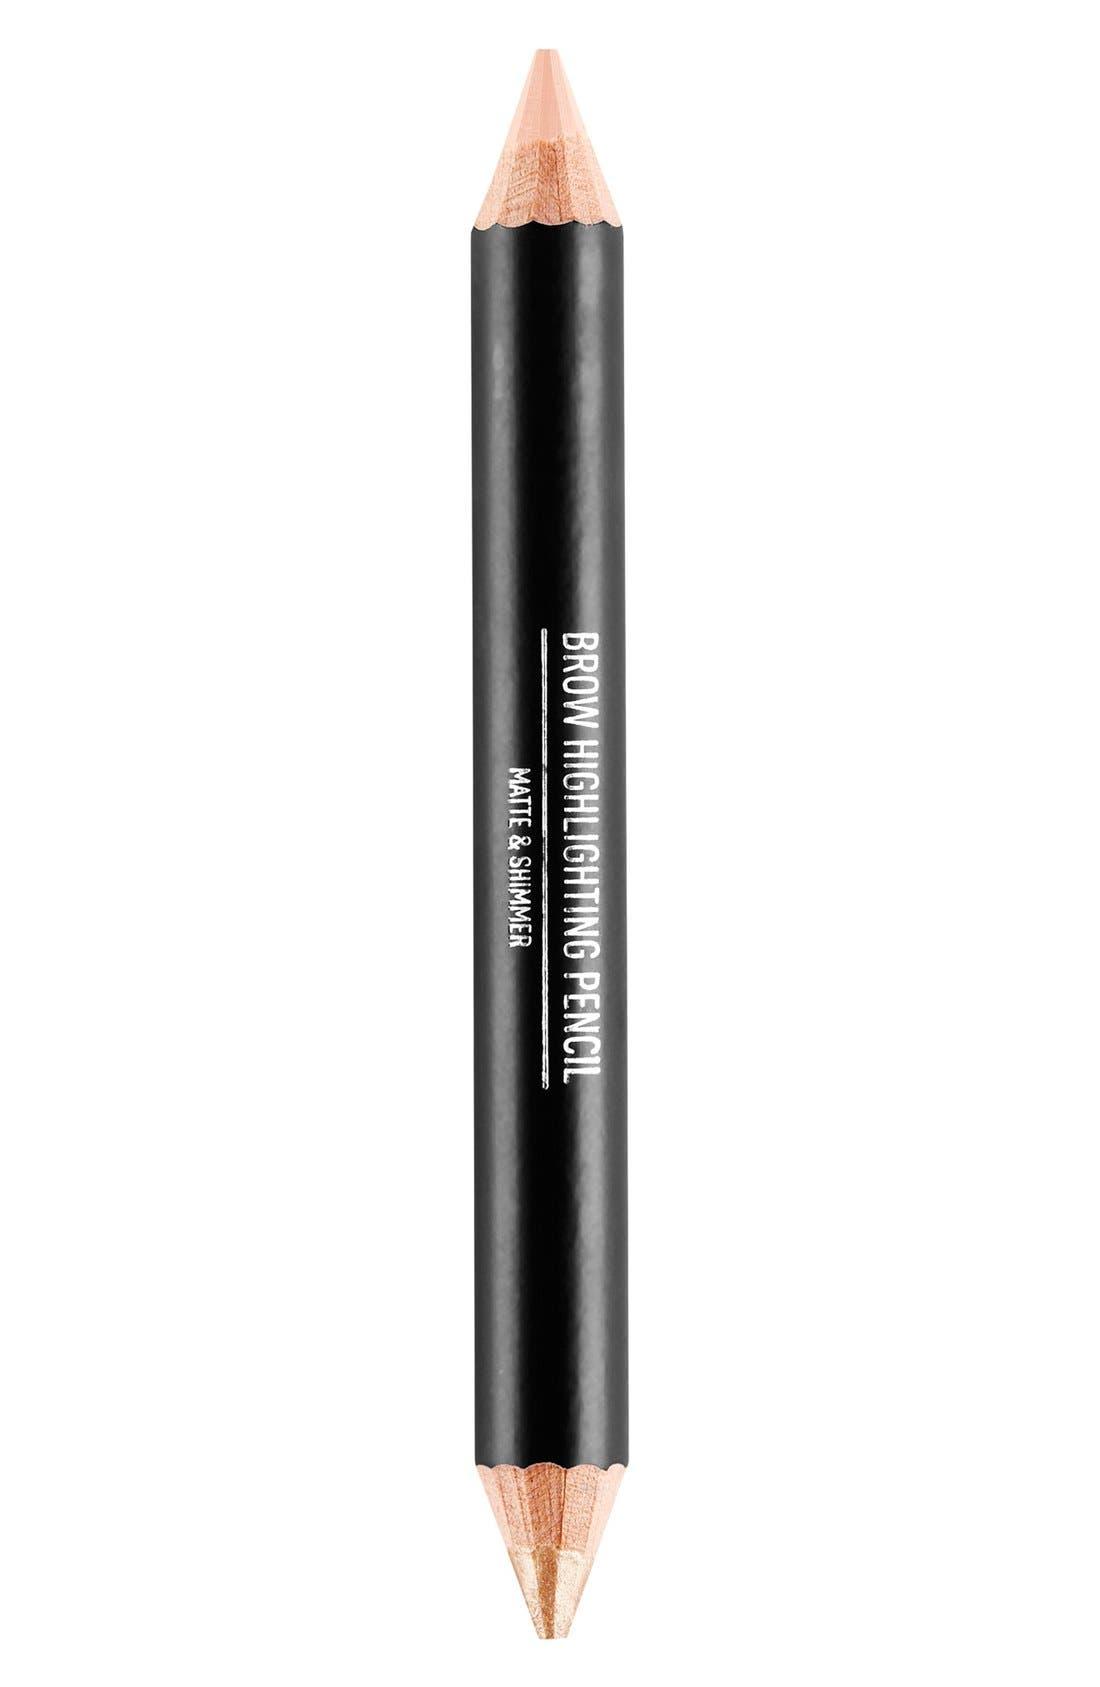 Sigma Beauty Brow Highlighting Pencil